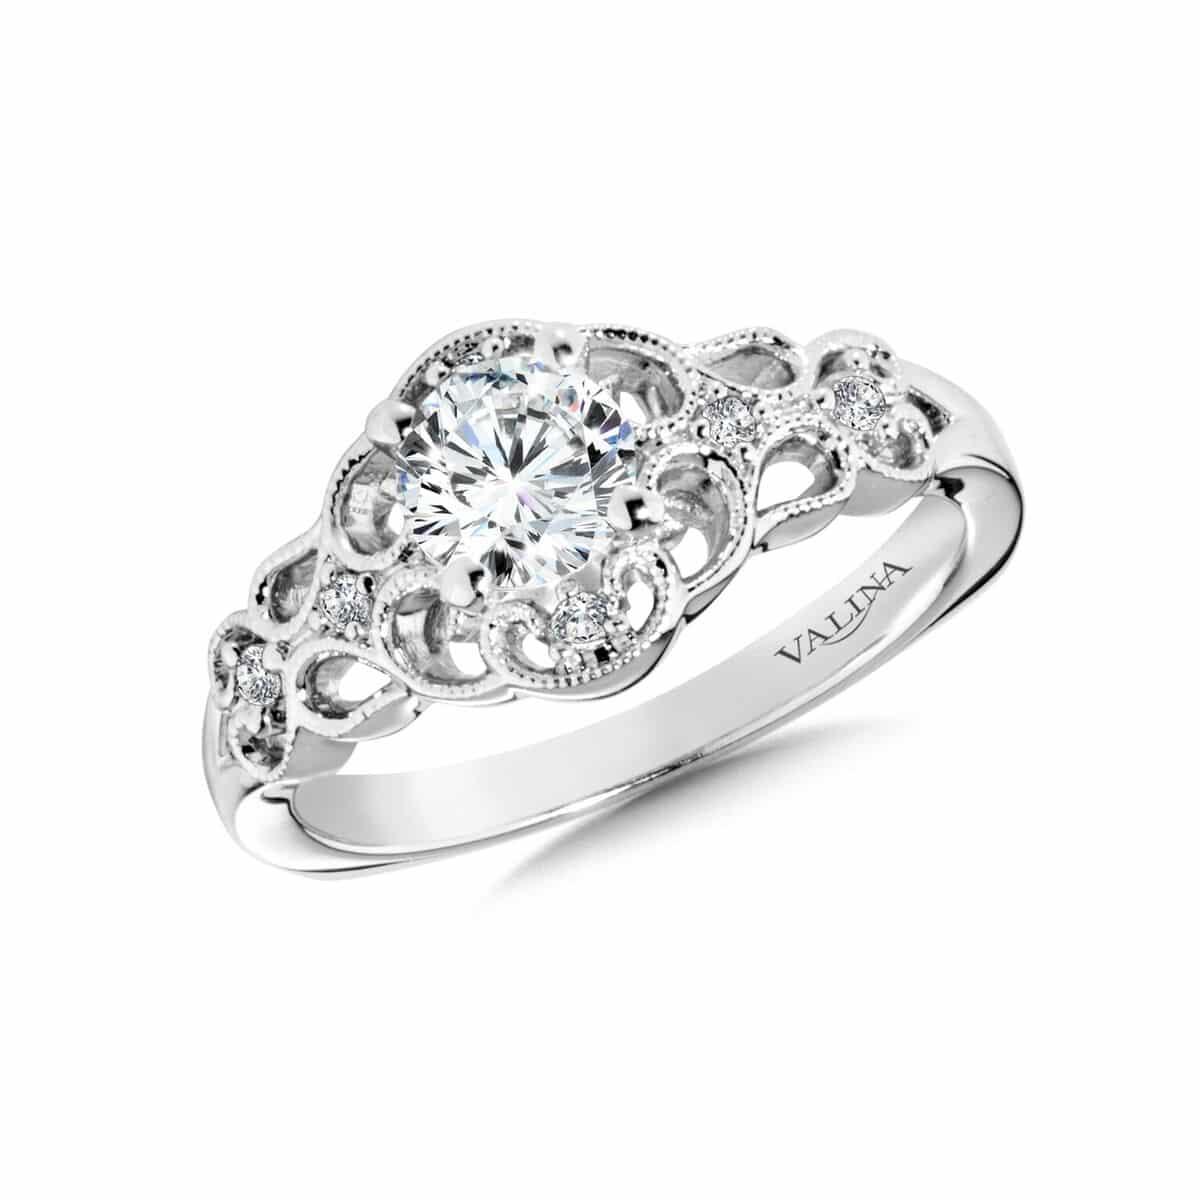 Custom Flower Engagement Ring Dallas Texas - Wholesale Diamonds - Loose Diamonds Dallas 3